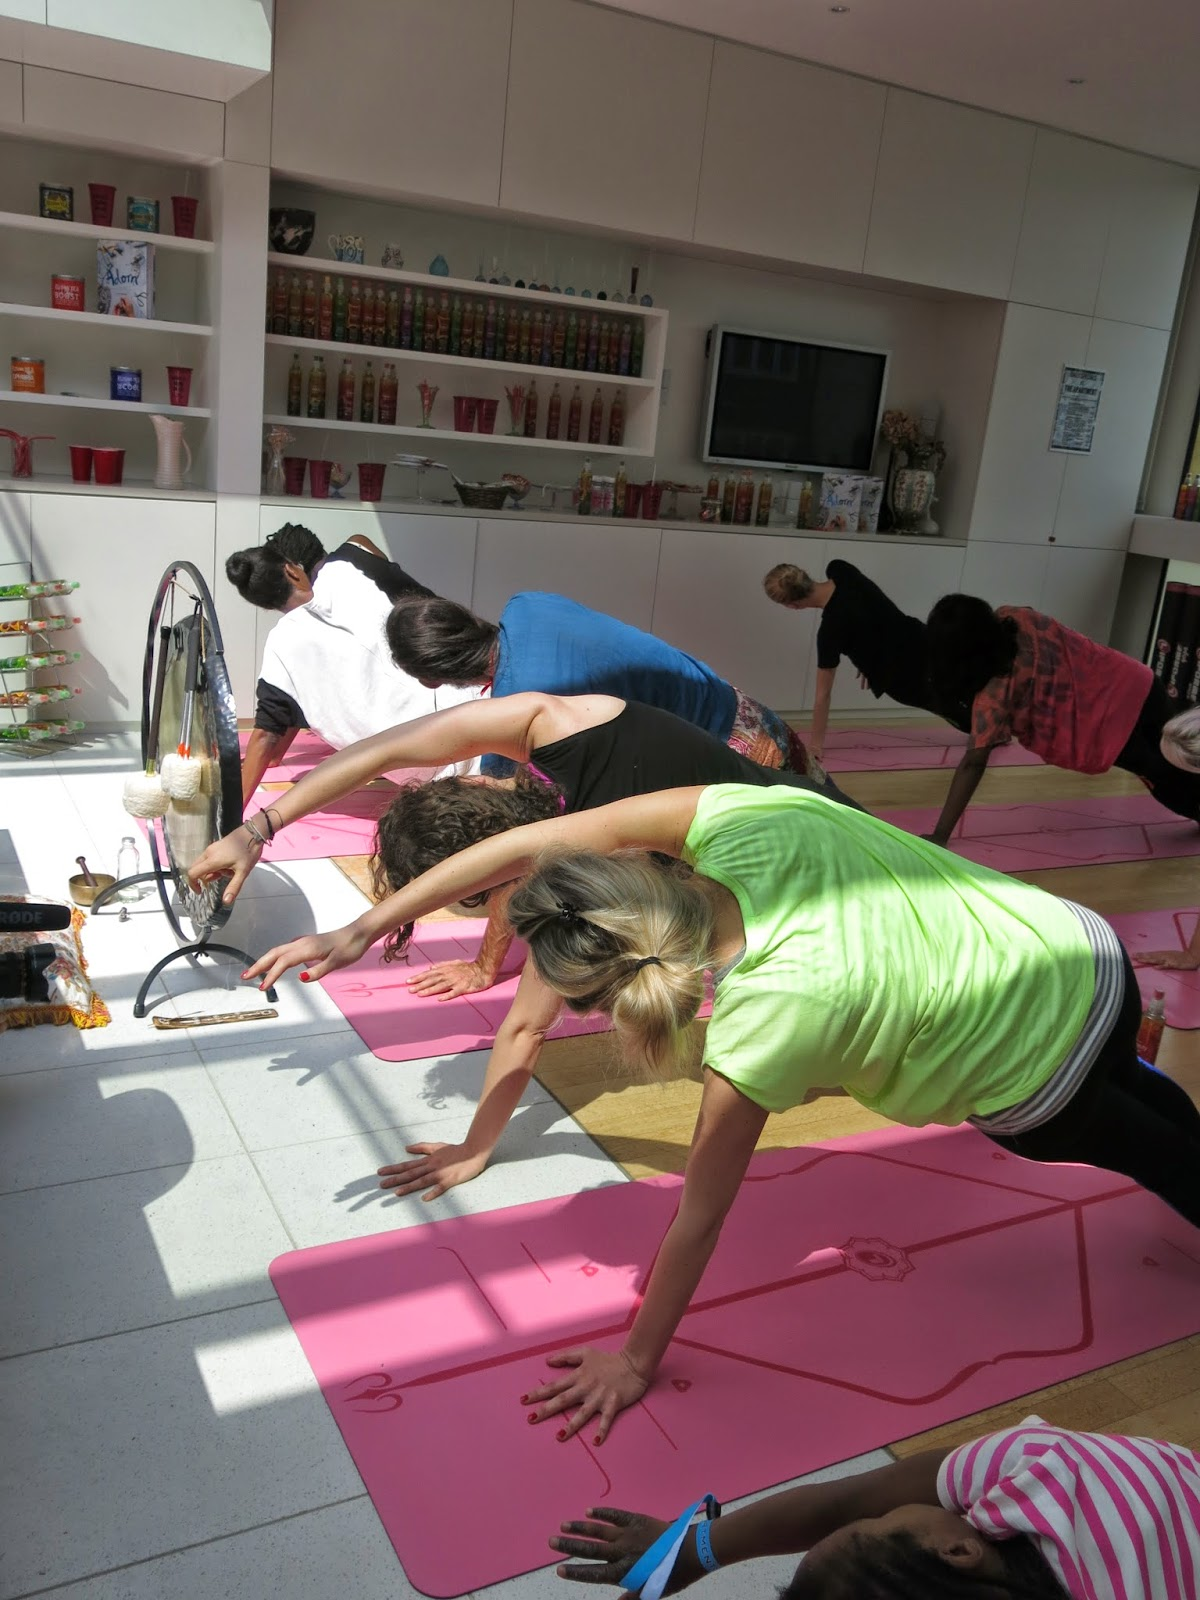 yoga, lifeorme, lifeorme yoga mats, yoga mats